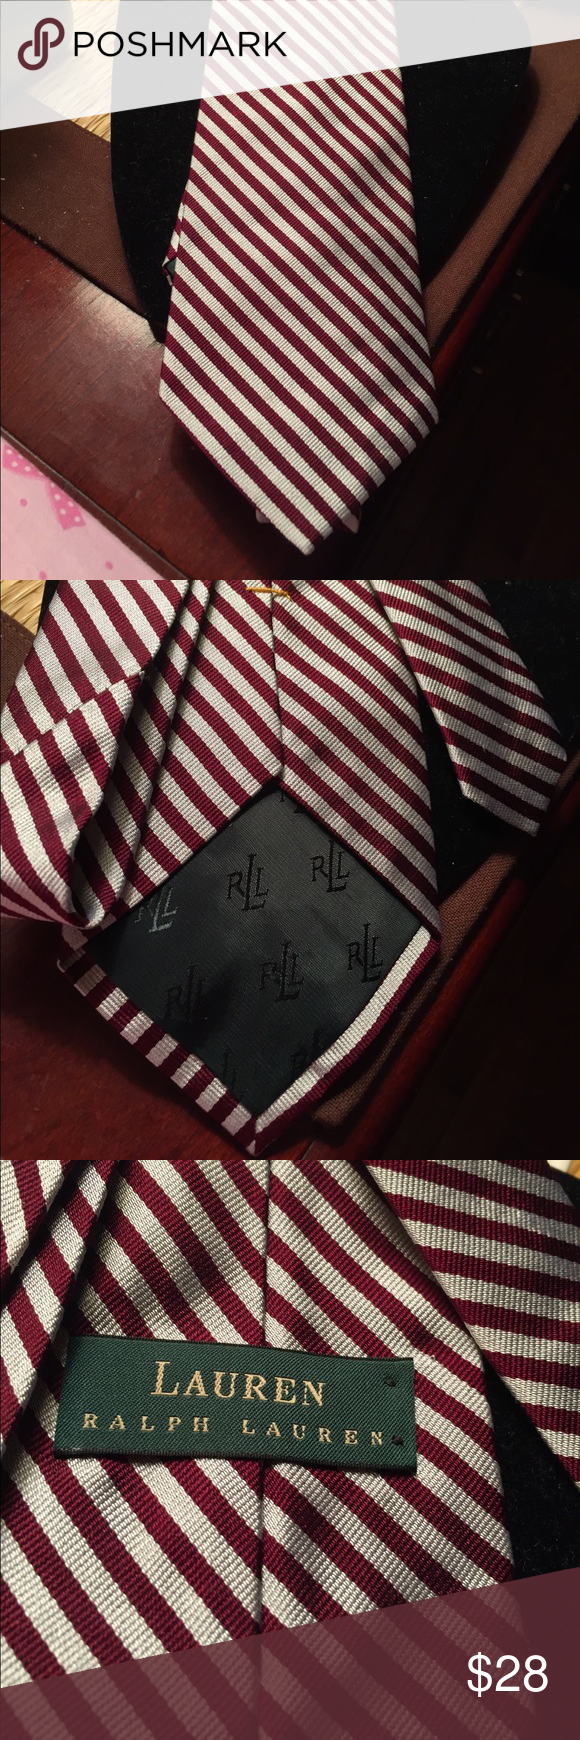 Ralph Lauren Silk tie Gorgeous Ralph Lauren Silk tie. Colors in silver gray and wine. Striking combination. Amazing quality in fantastic condition.  No damage or stains. Dress great for less. Lauren Ralph Lauren Accessories Ties